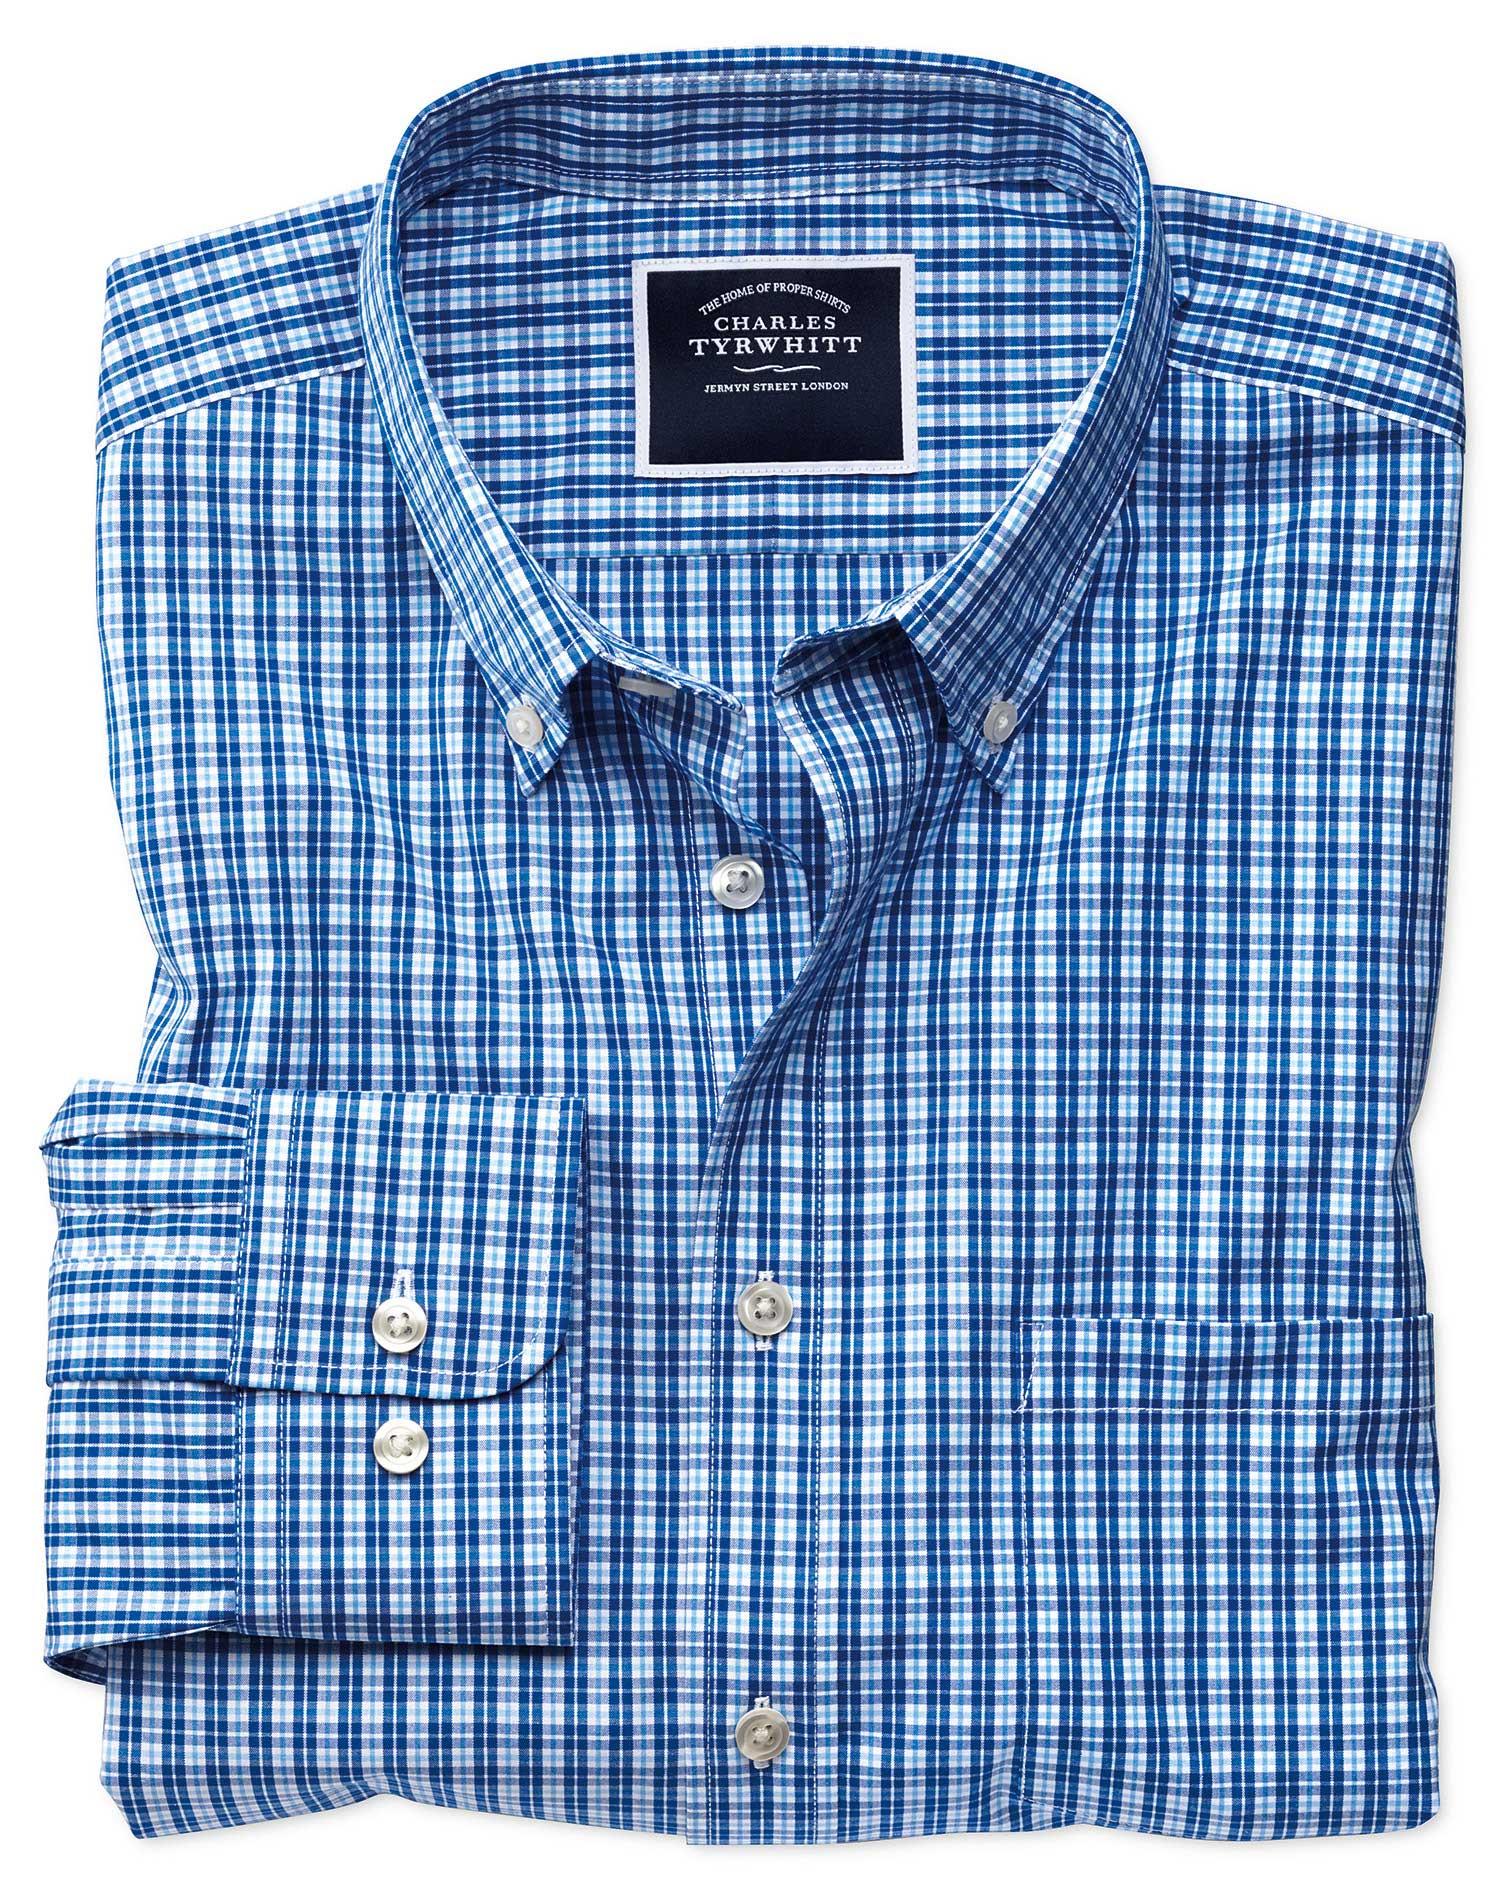 Classic Fit Non-Iron Bright Blue Gingham Cotton Shirt Single Cuff Size XXL by Charles Tyrwhitt